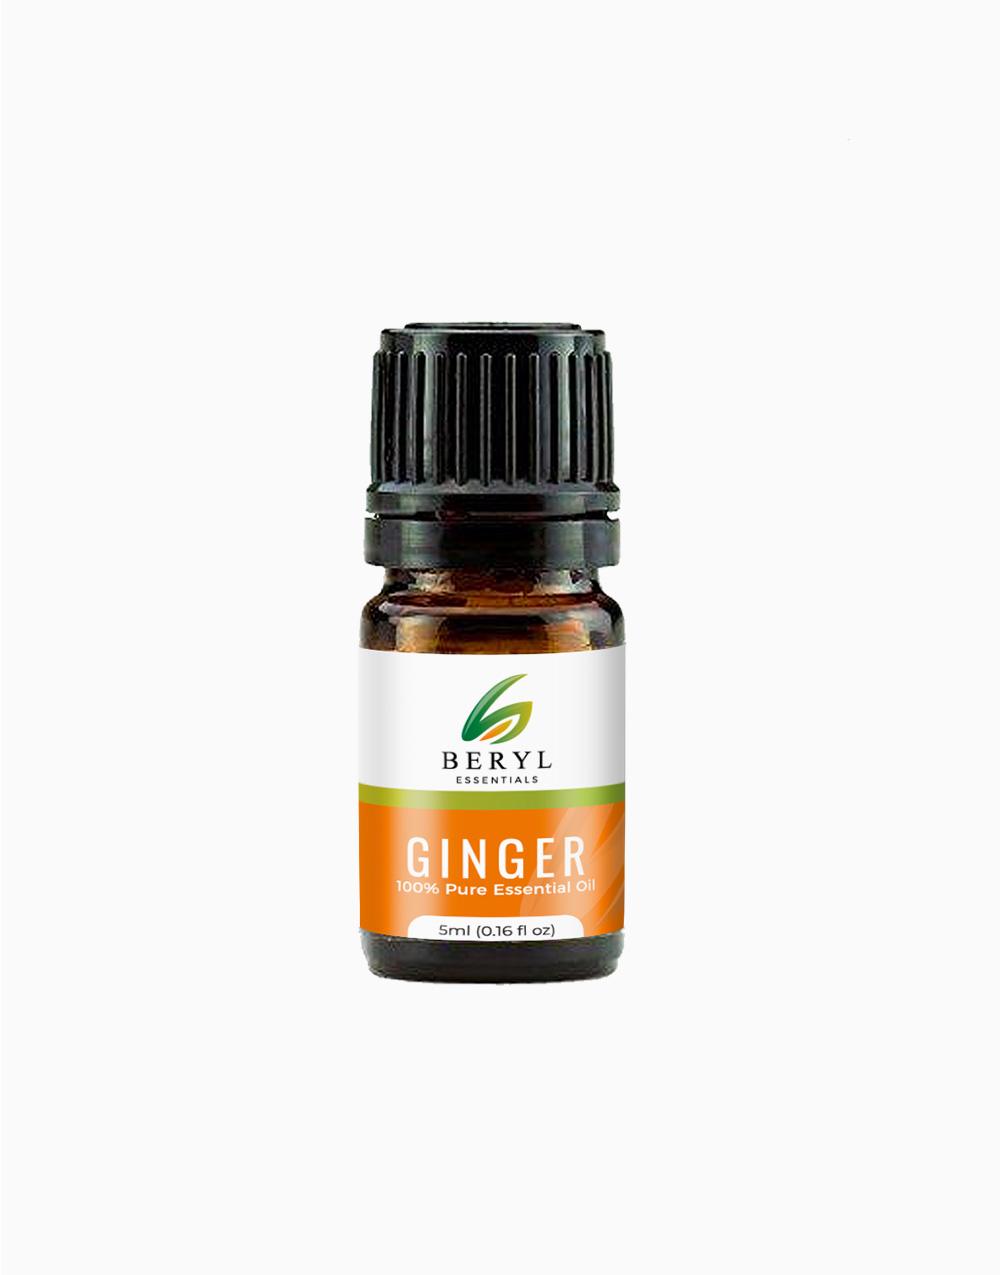 Ginger Essential Oil (5ml) by Beryl Essentials